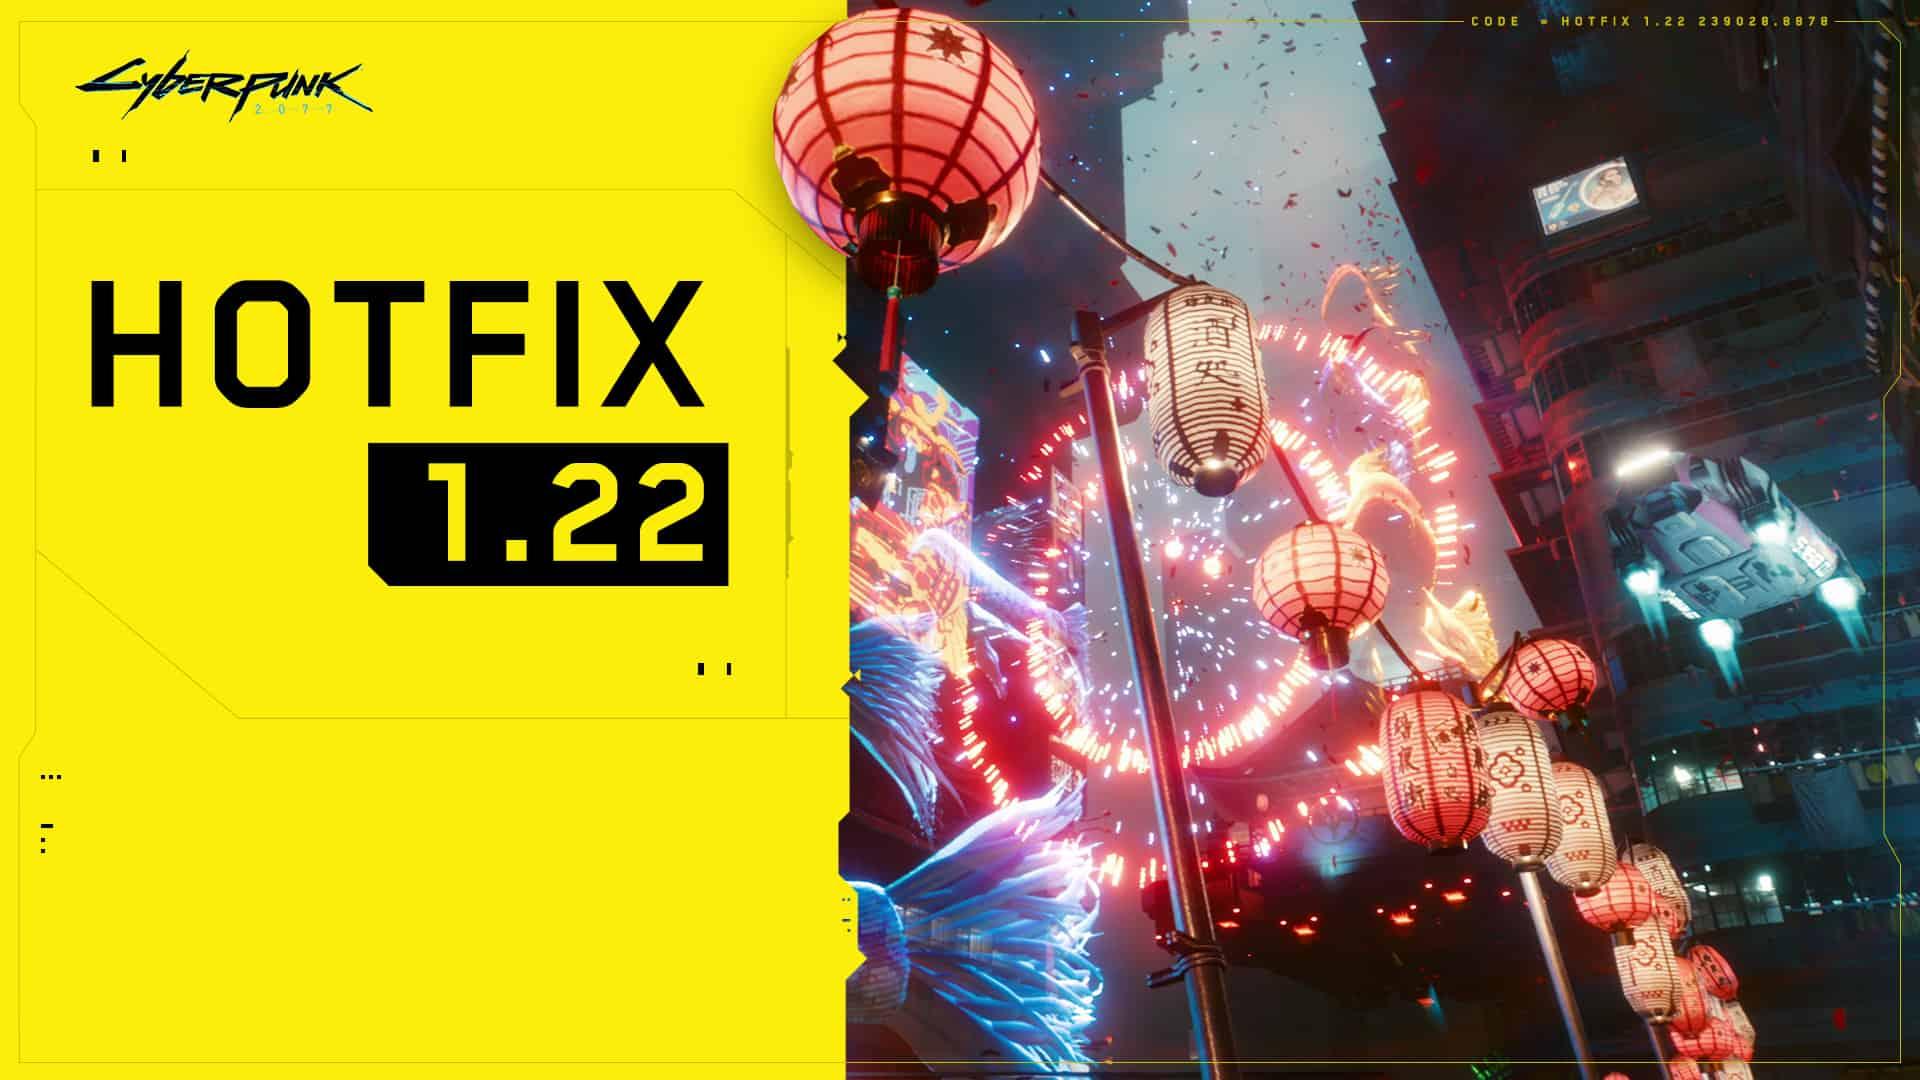 Cyberpunk 2077 Hotfix 1.22